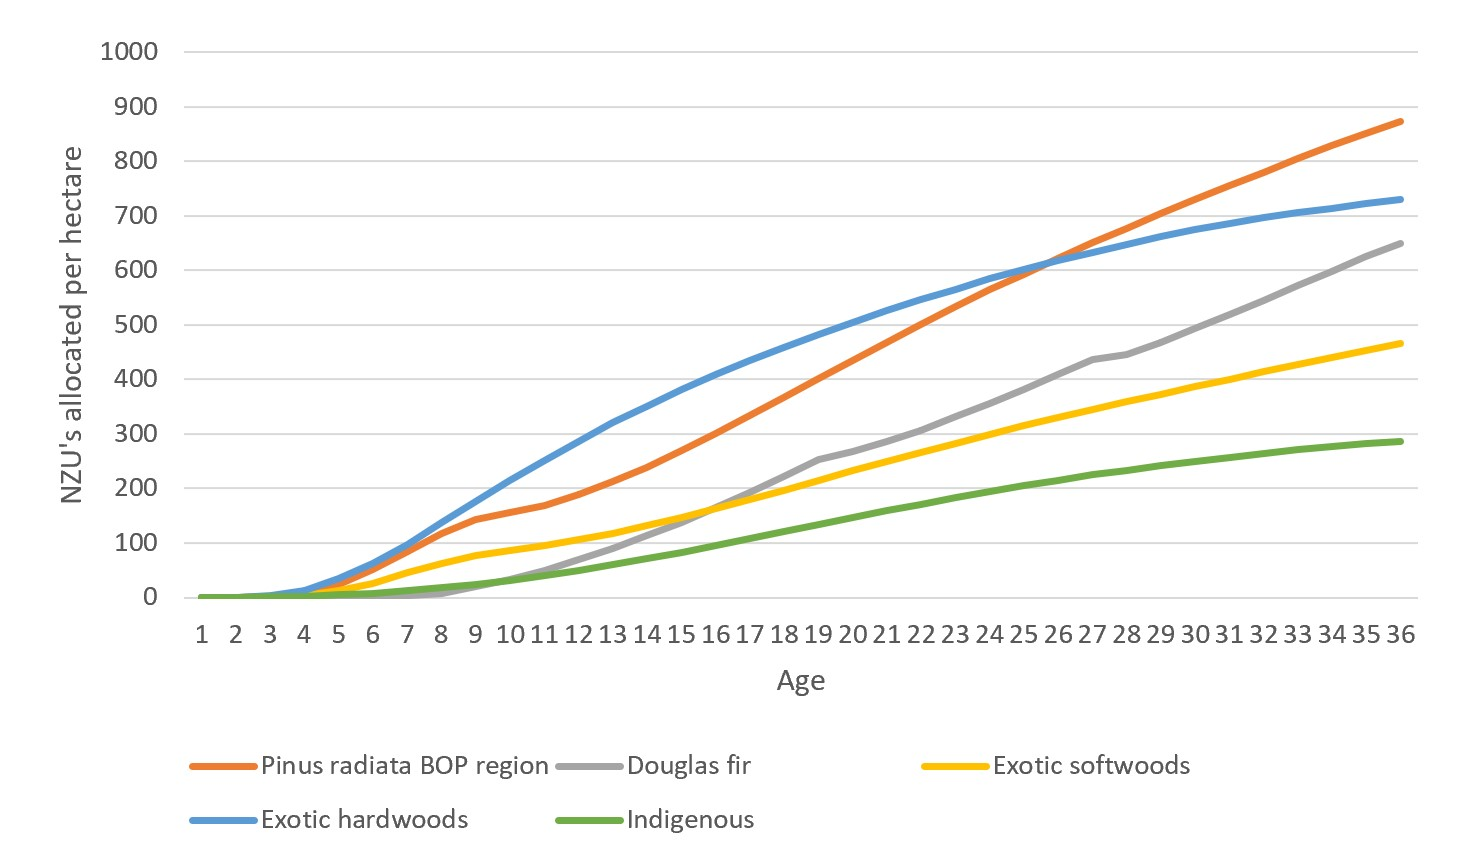 ETS National NZU Averages Per HA